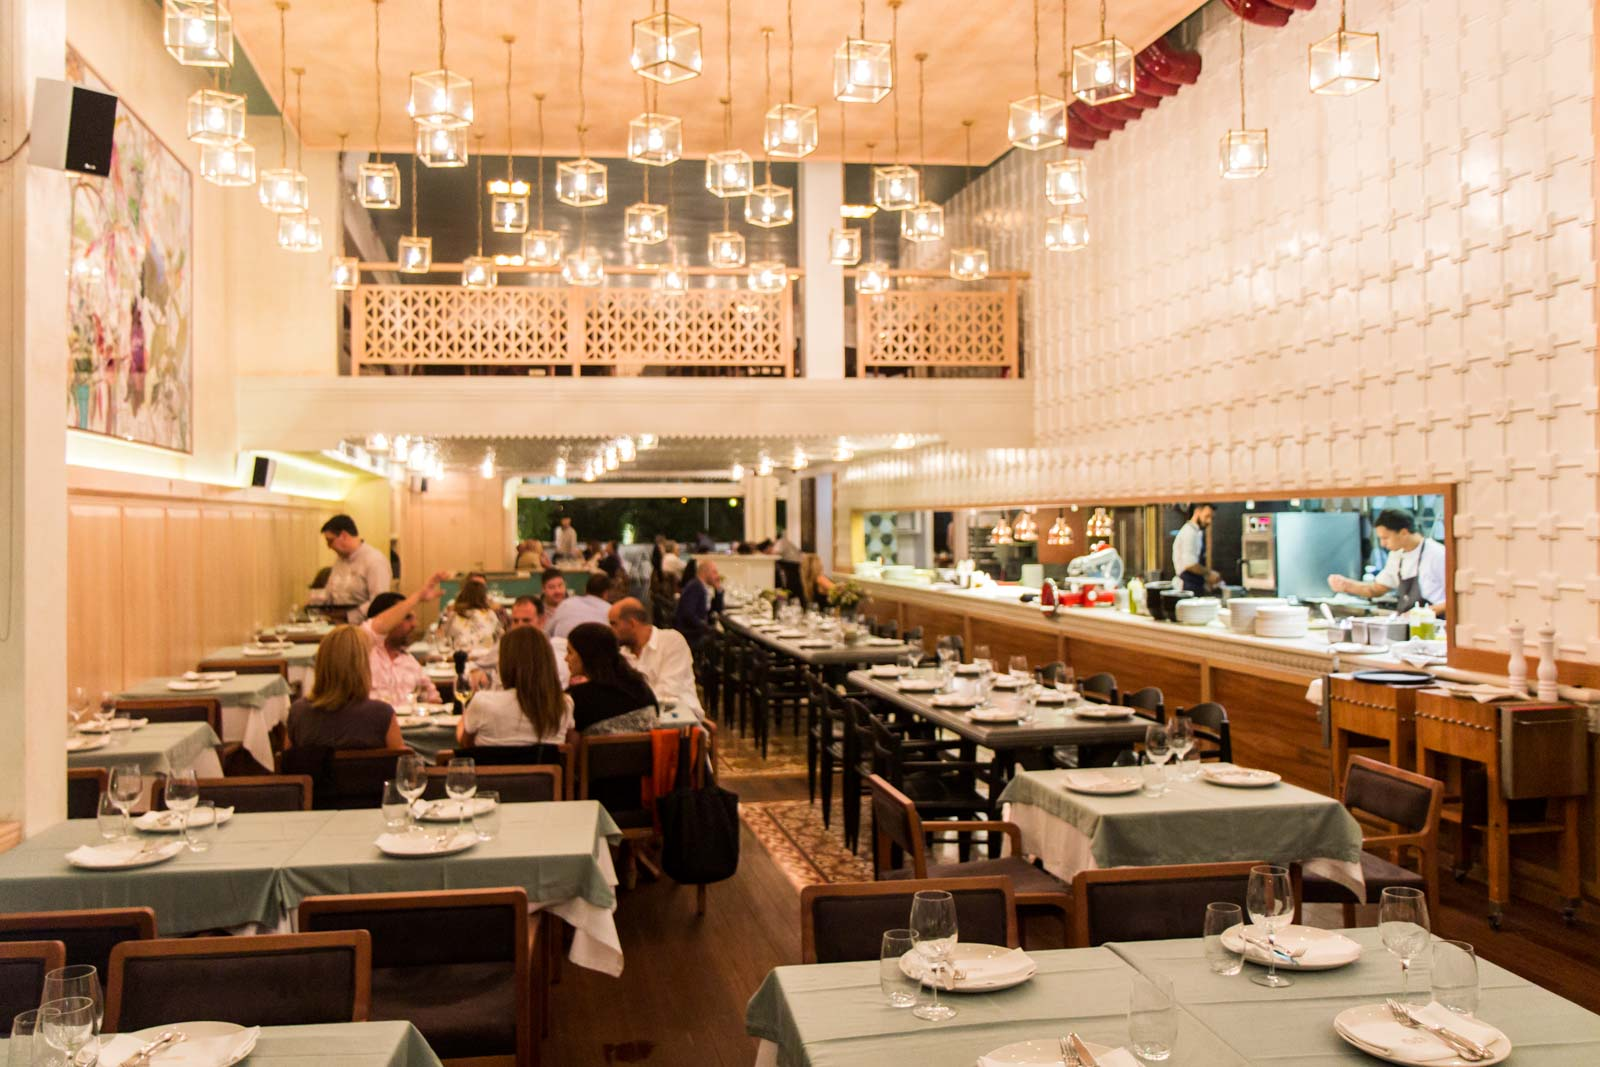 Cookoovaya restaurant, Athens